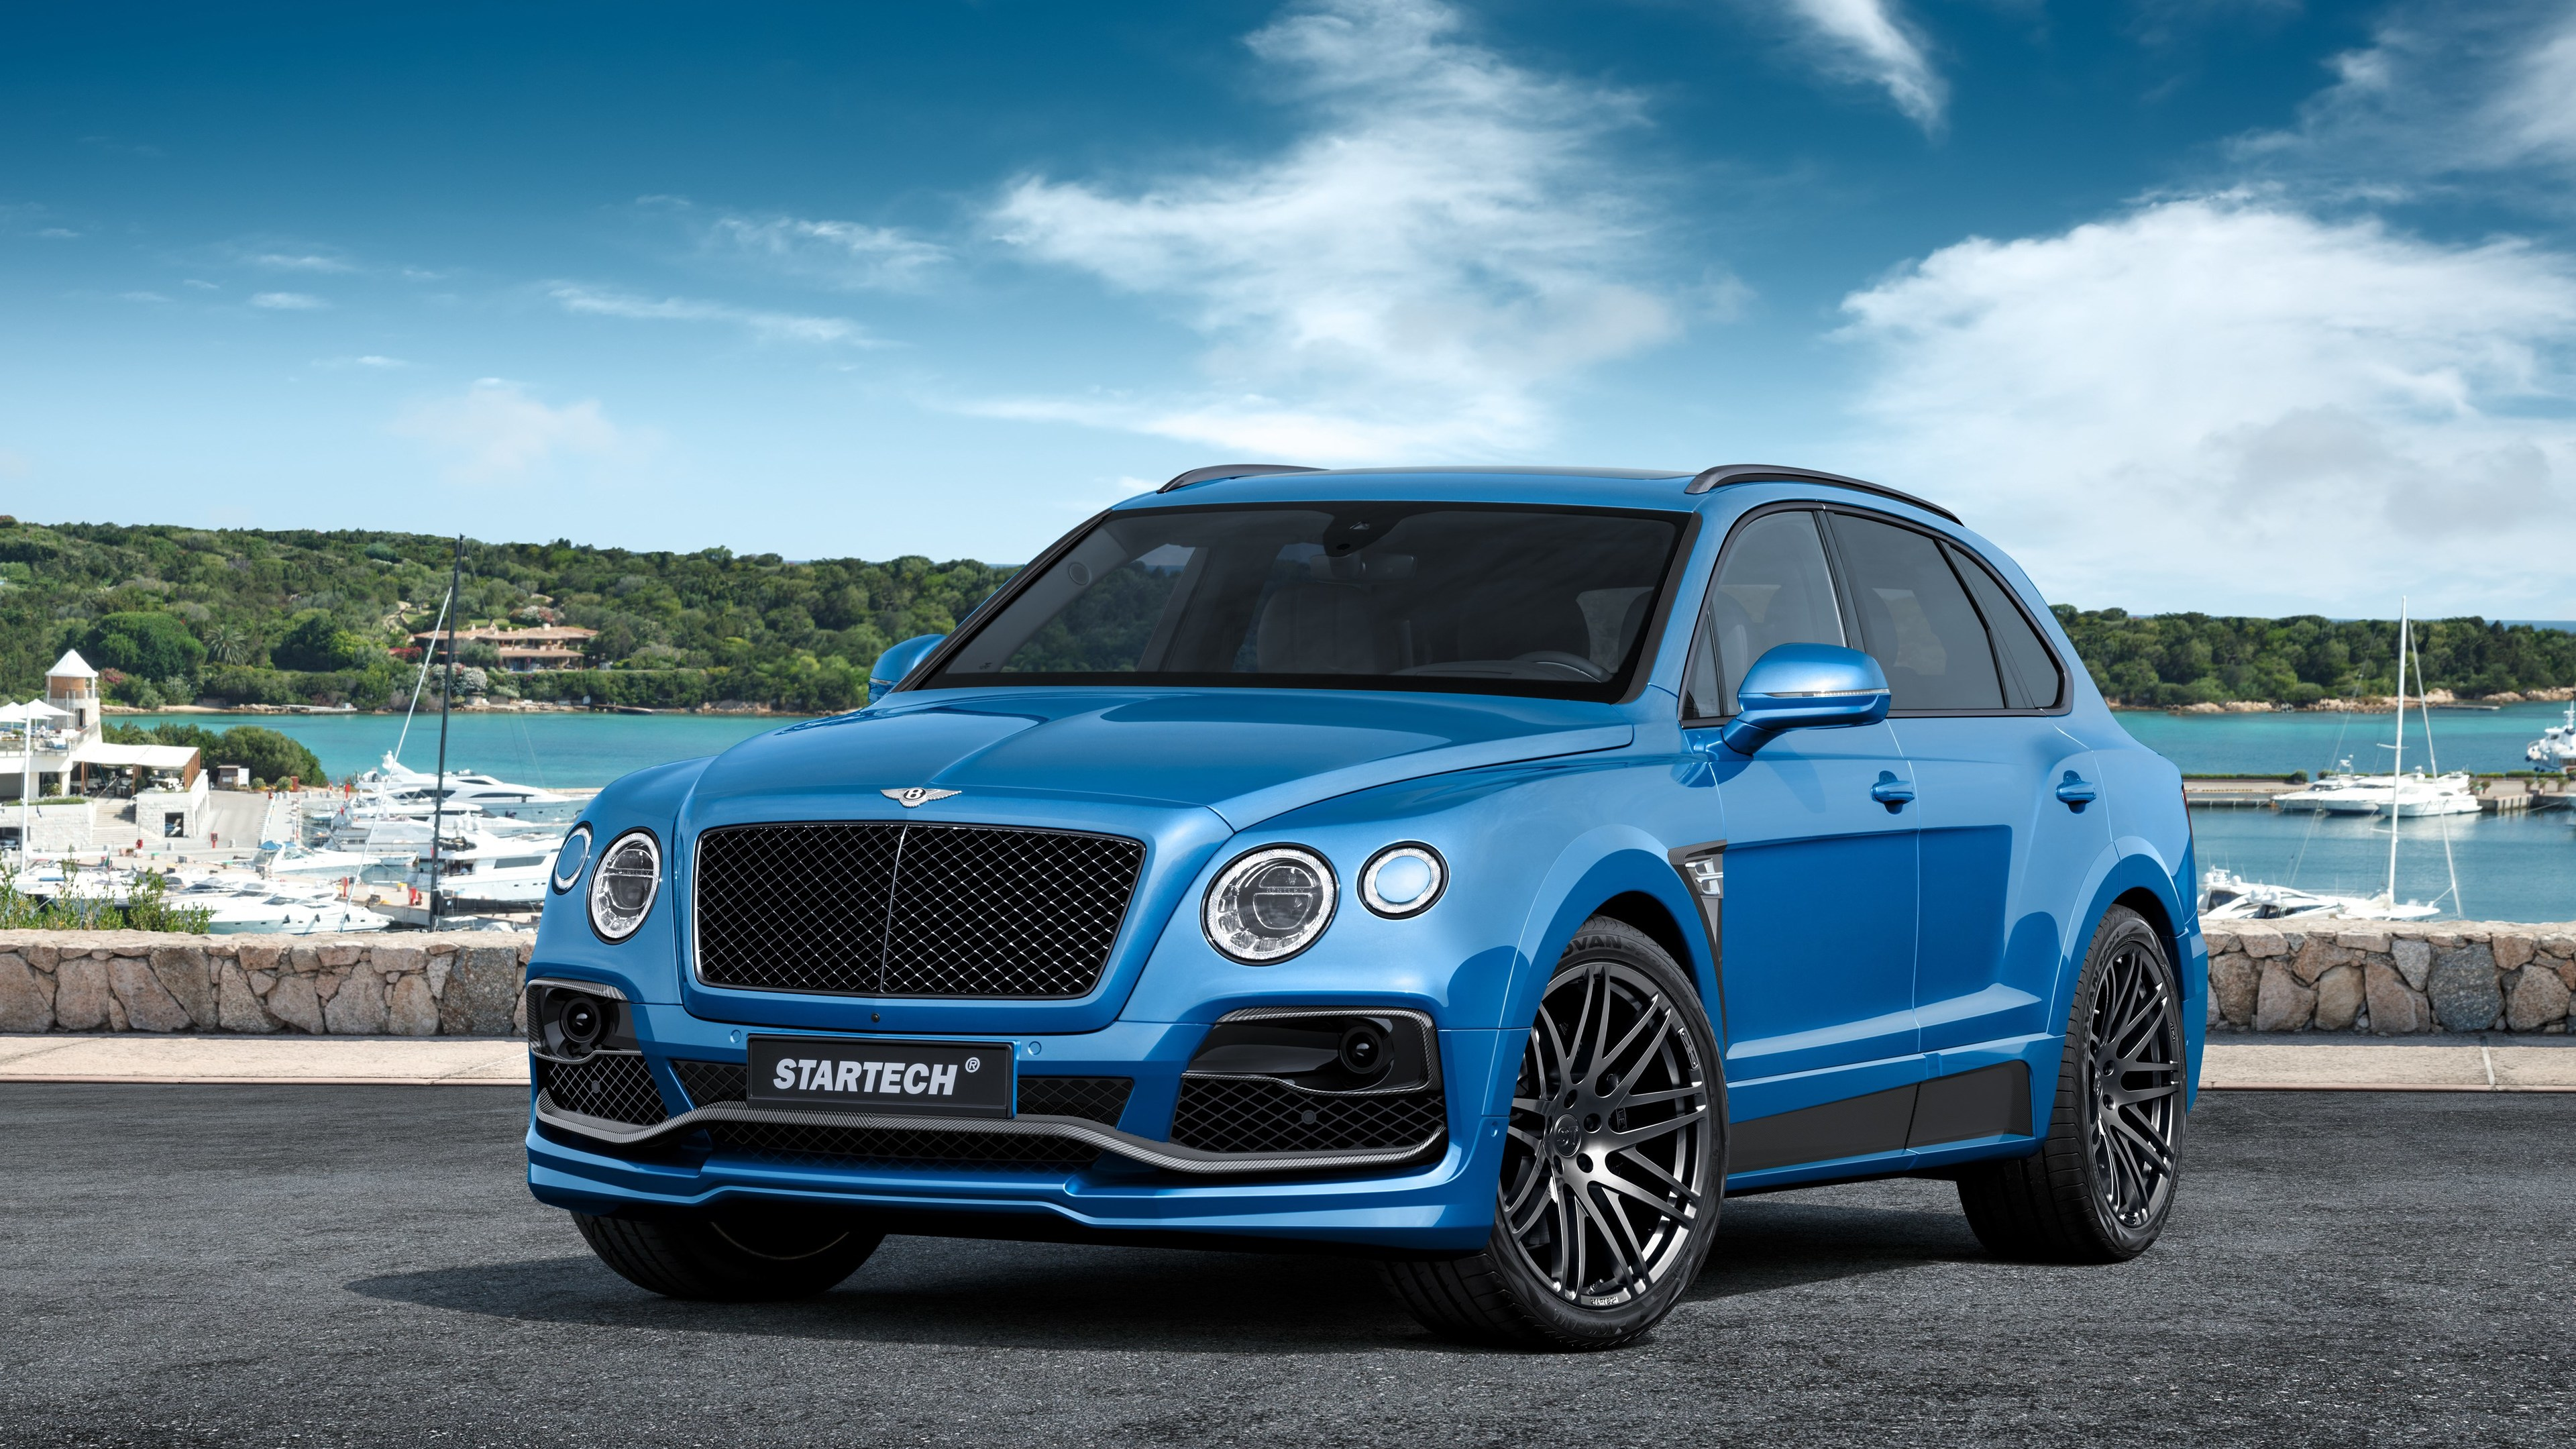 2016 bentley bentayga 1539104729 - 2016 Bentley Bentayga - bentley wallpapers, bentley bentayga wallpapers, 2016 cars wallpapers